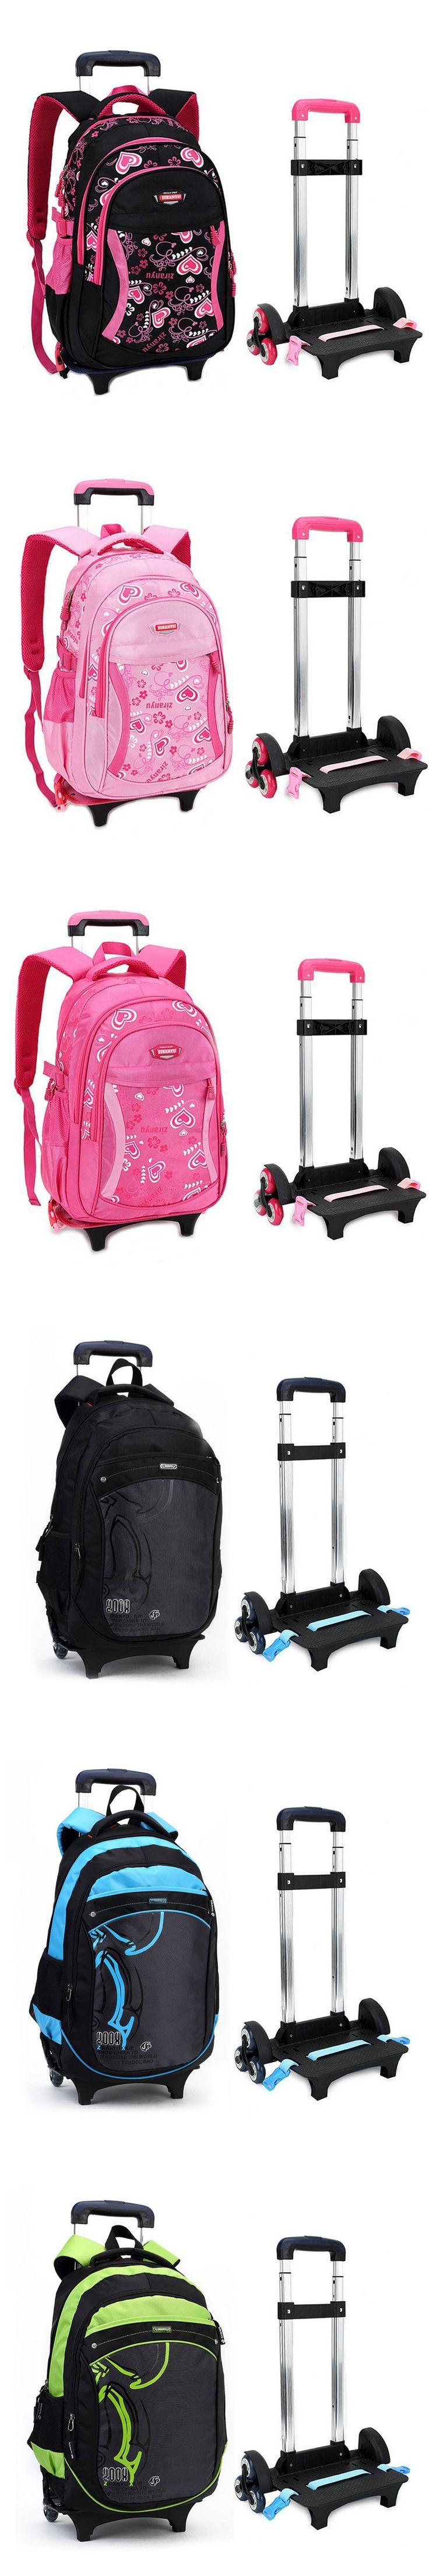 Trolley School Bag for Girls with Three Wheels Backpack Children Travel Bag Rolling Luggage Schoolbag Kids Mochilas Bagpack 9706